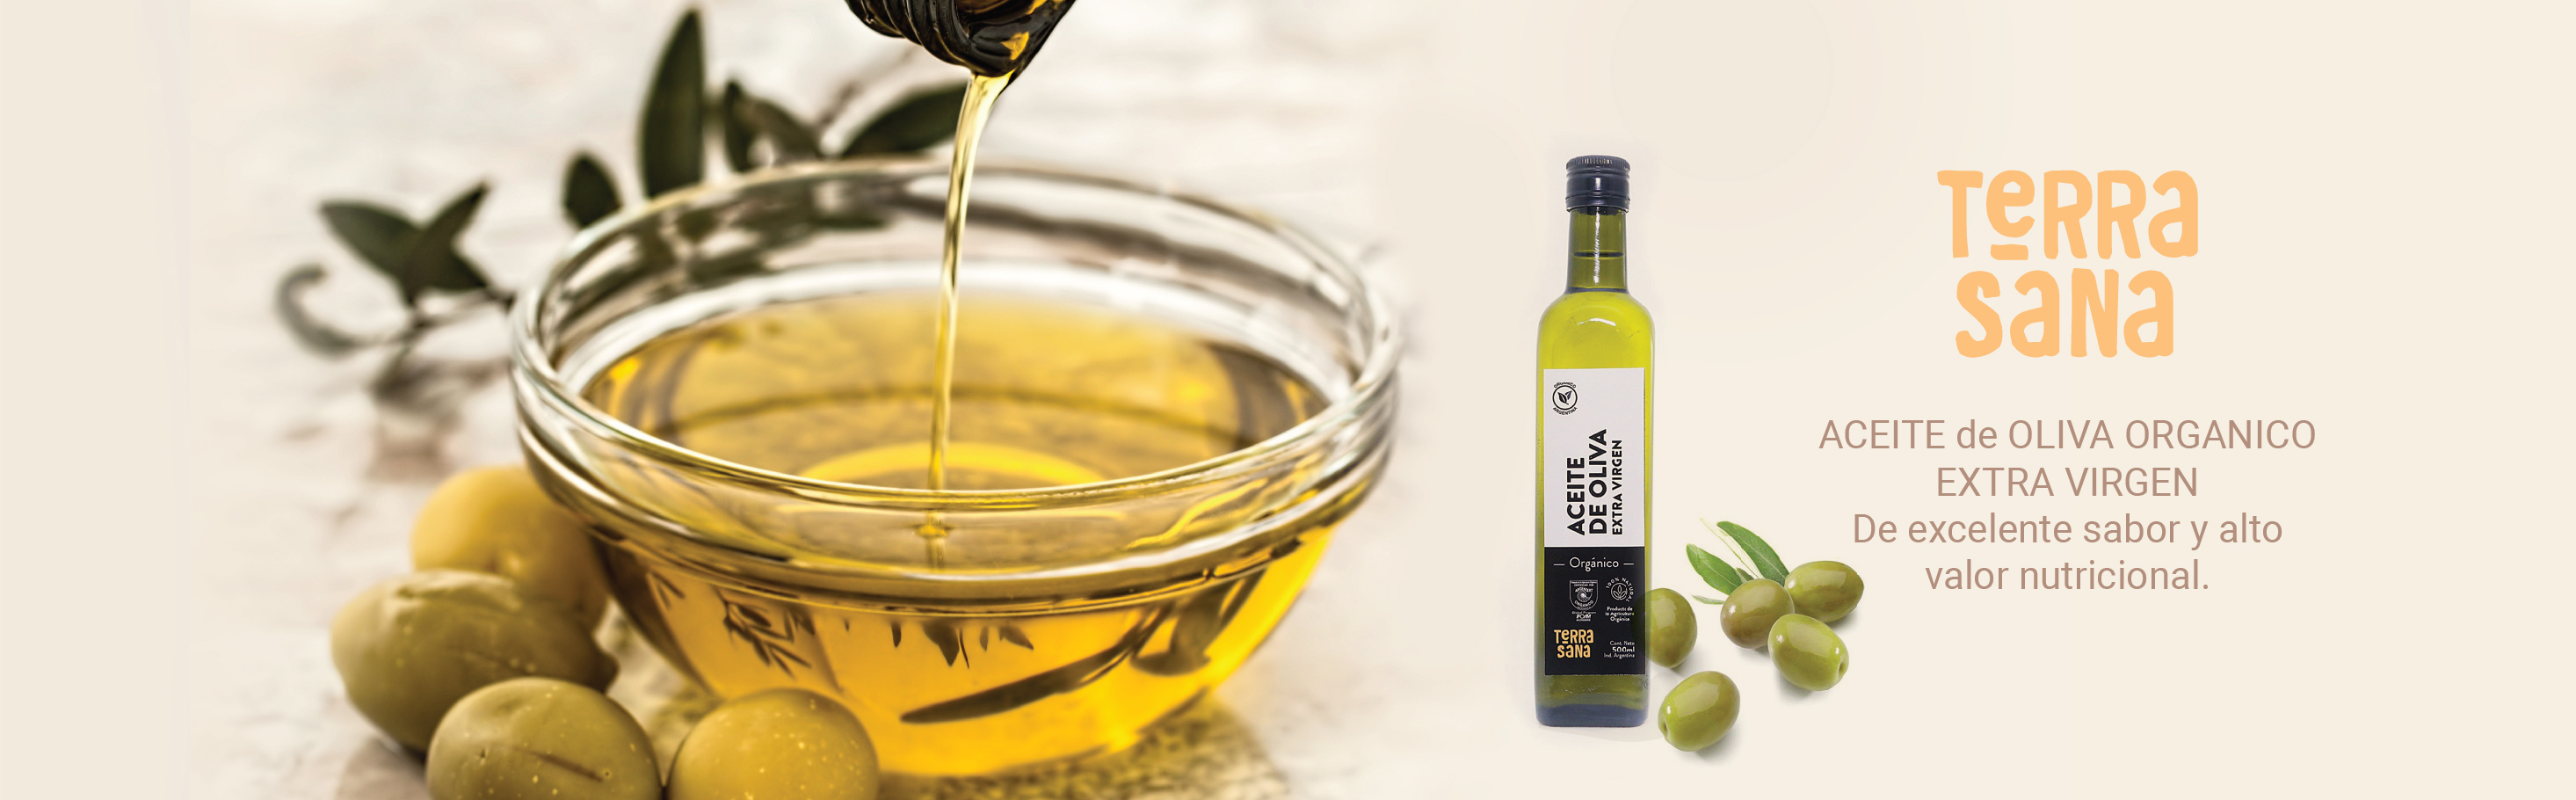 Aceite de oliva orgánico Terrasana